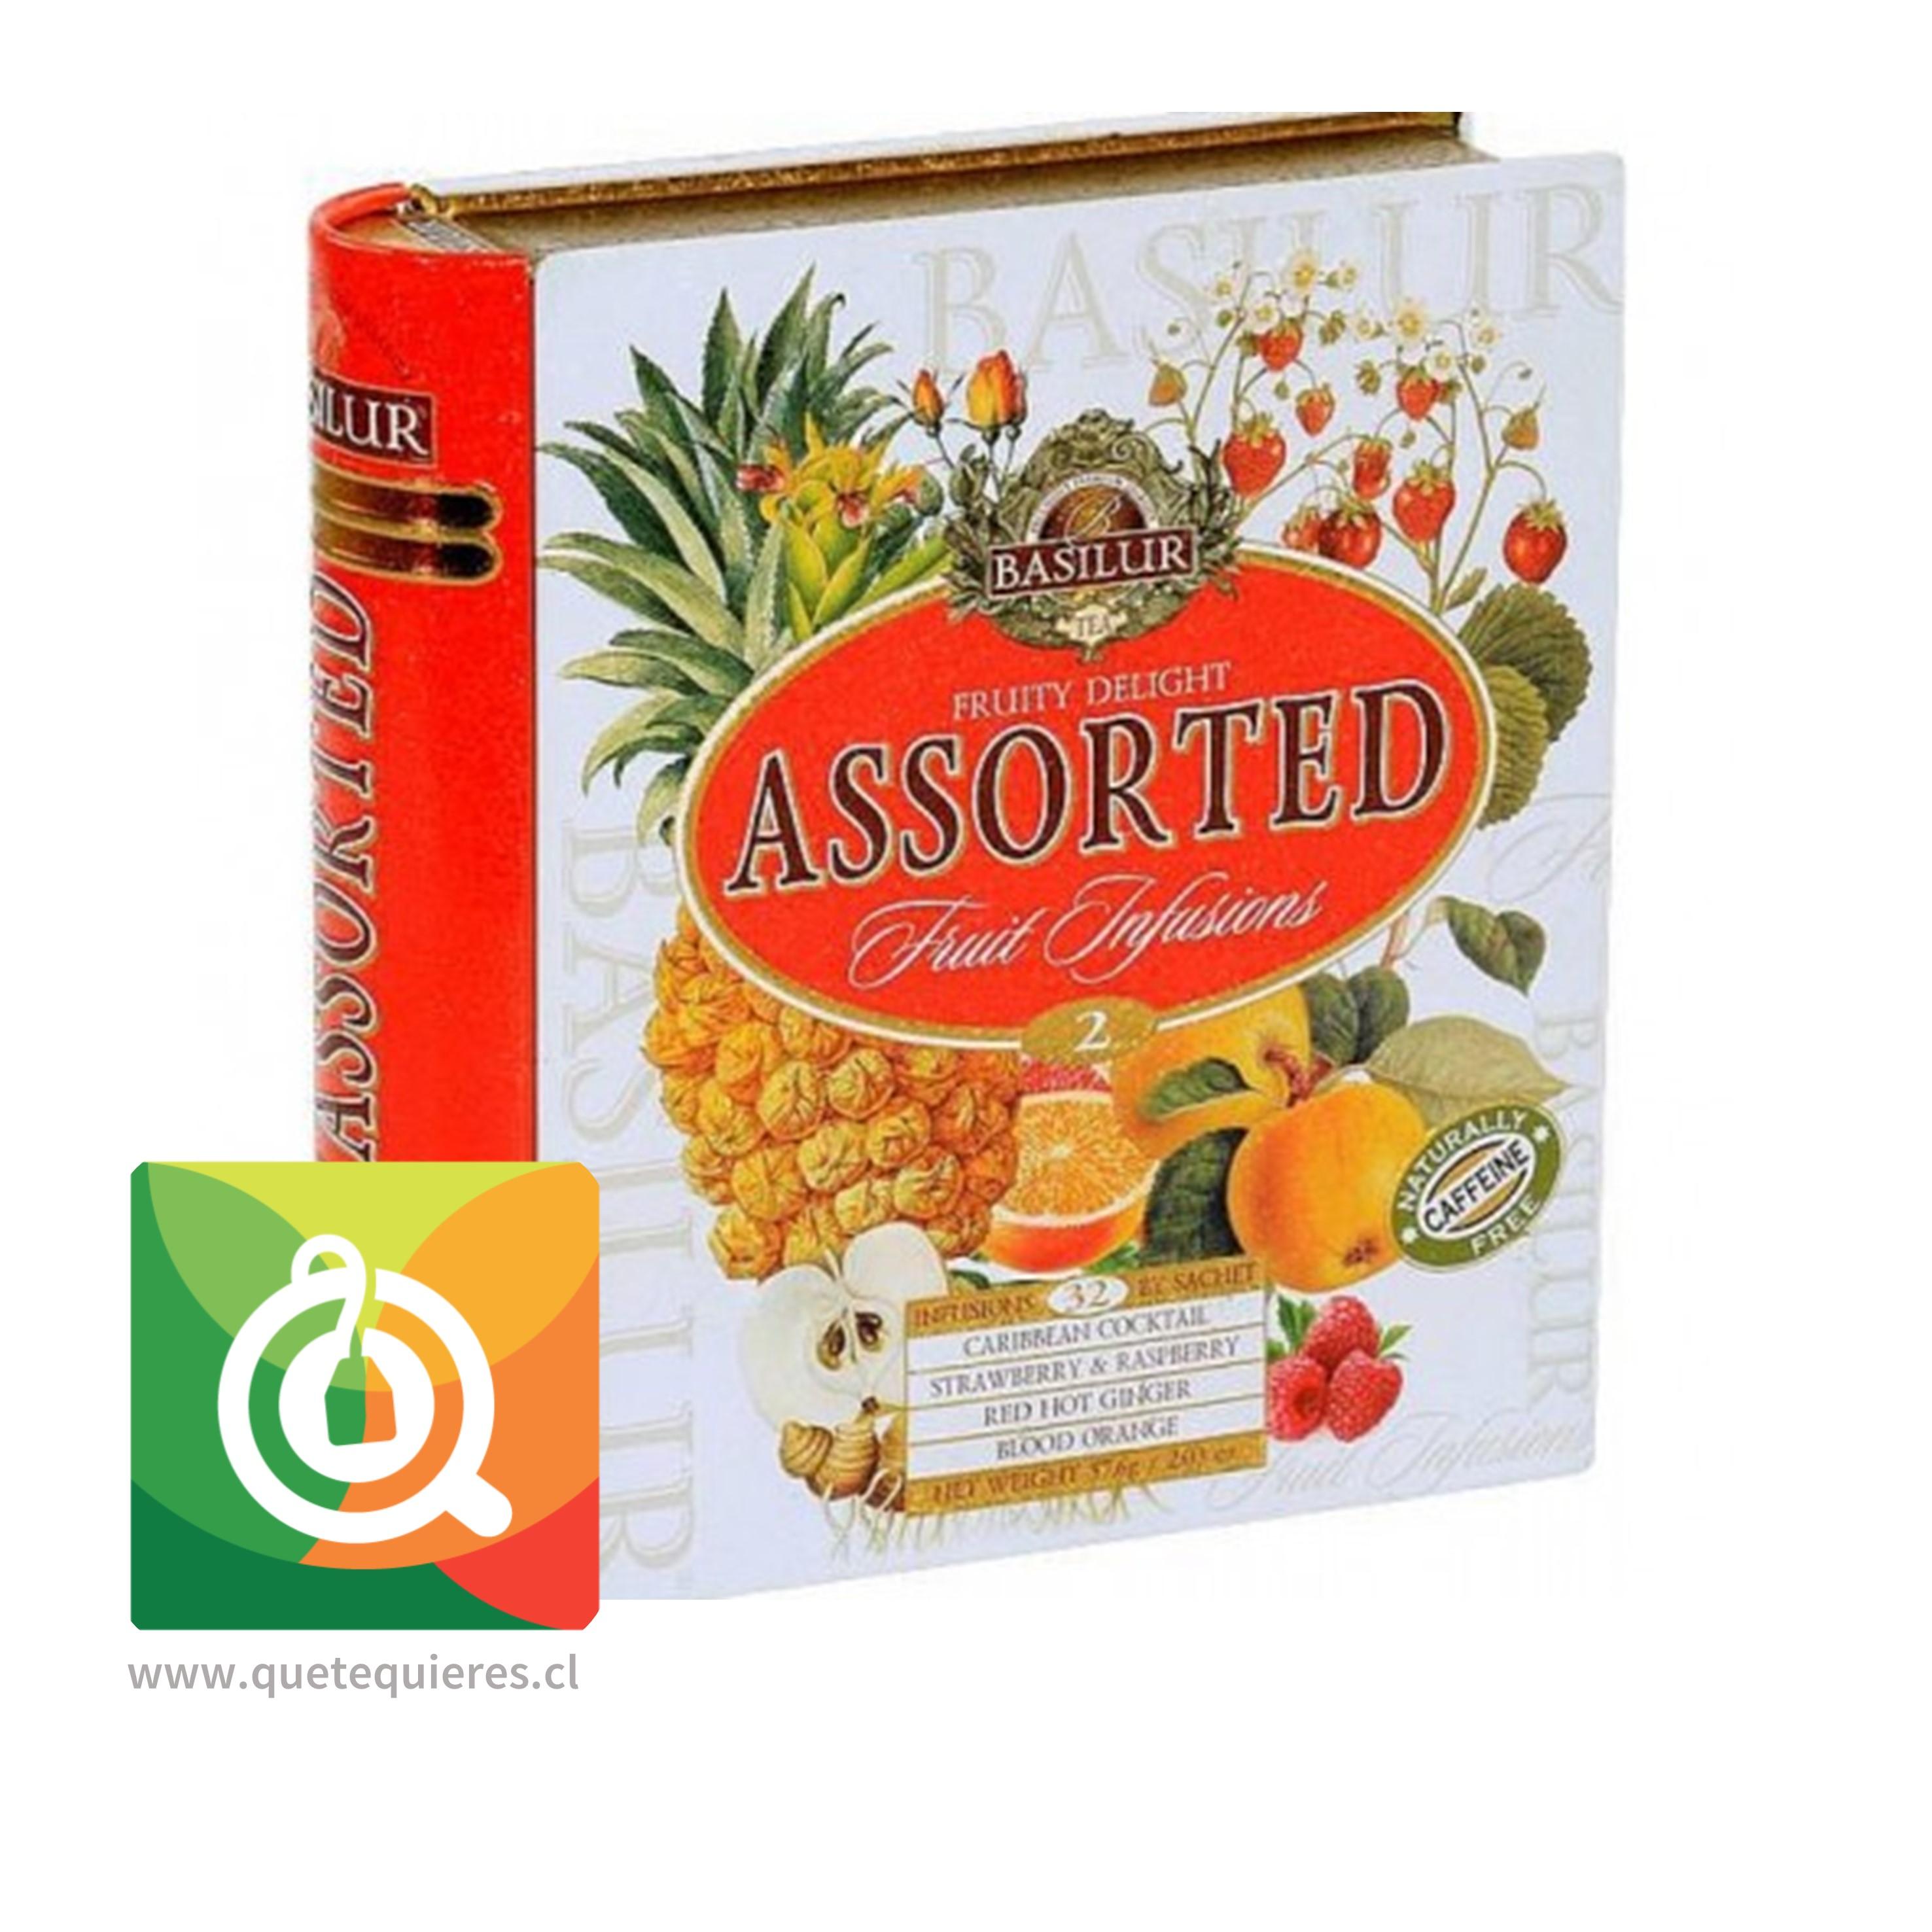 Basilur Libro Té Surtido Infusiones Frutales - Fruit infusion 2 Tea Book Assorted